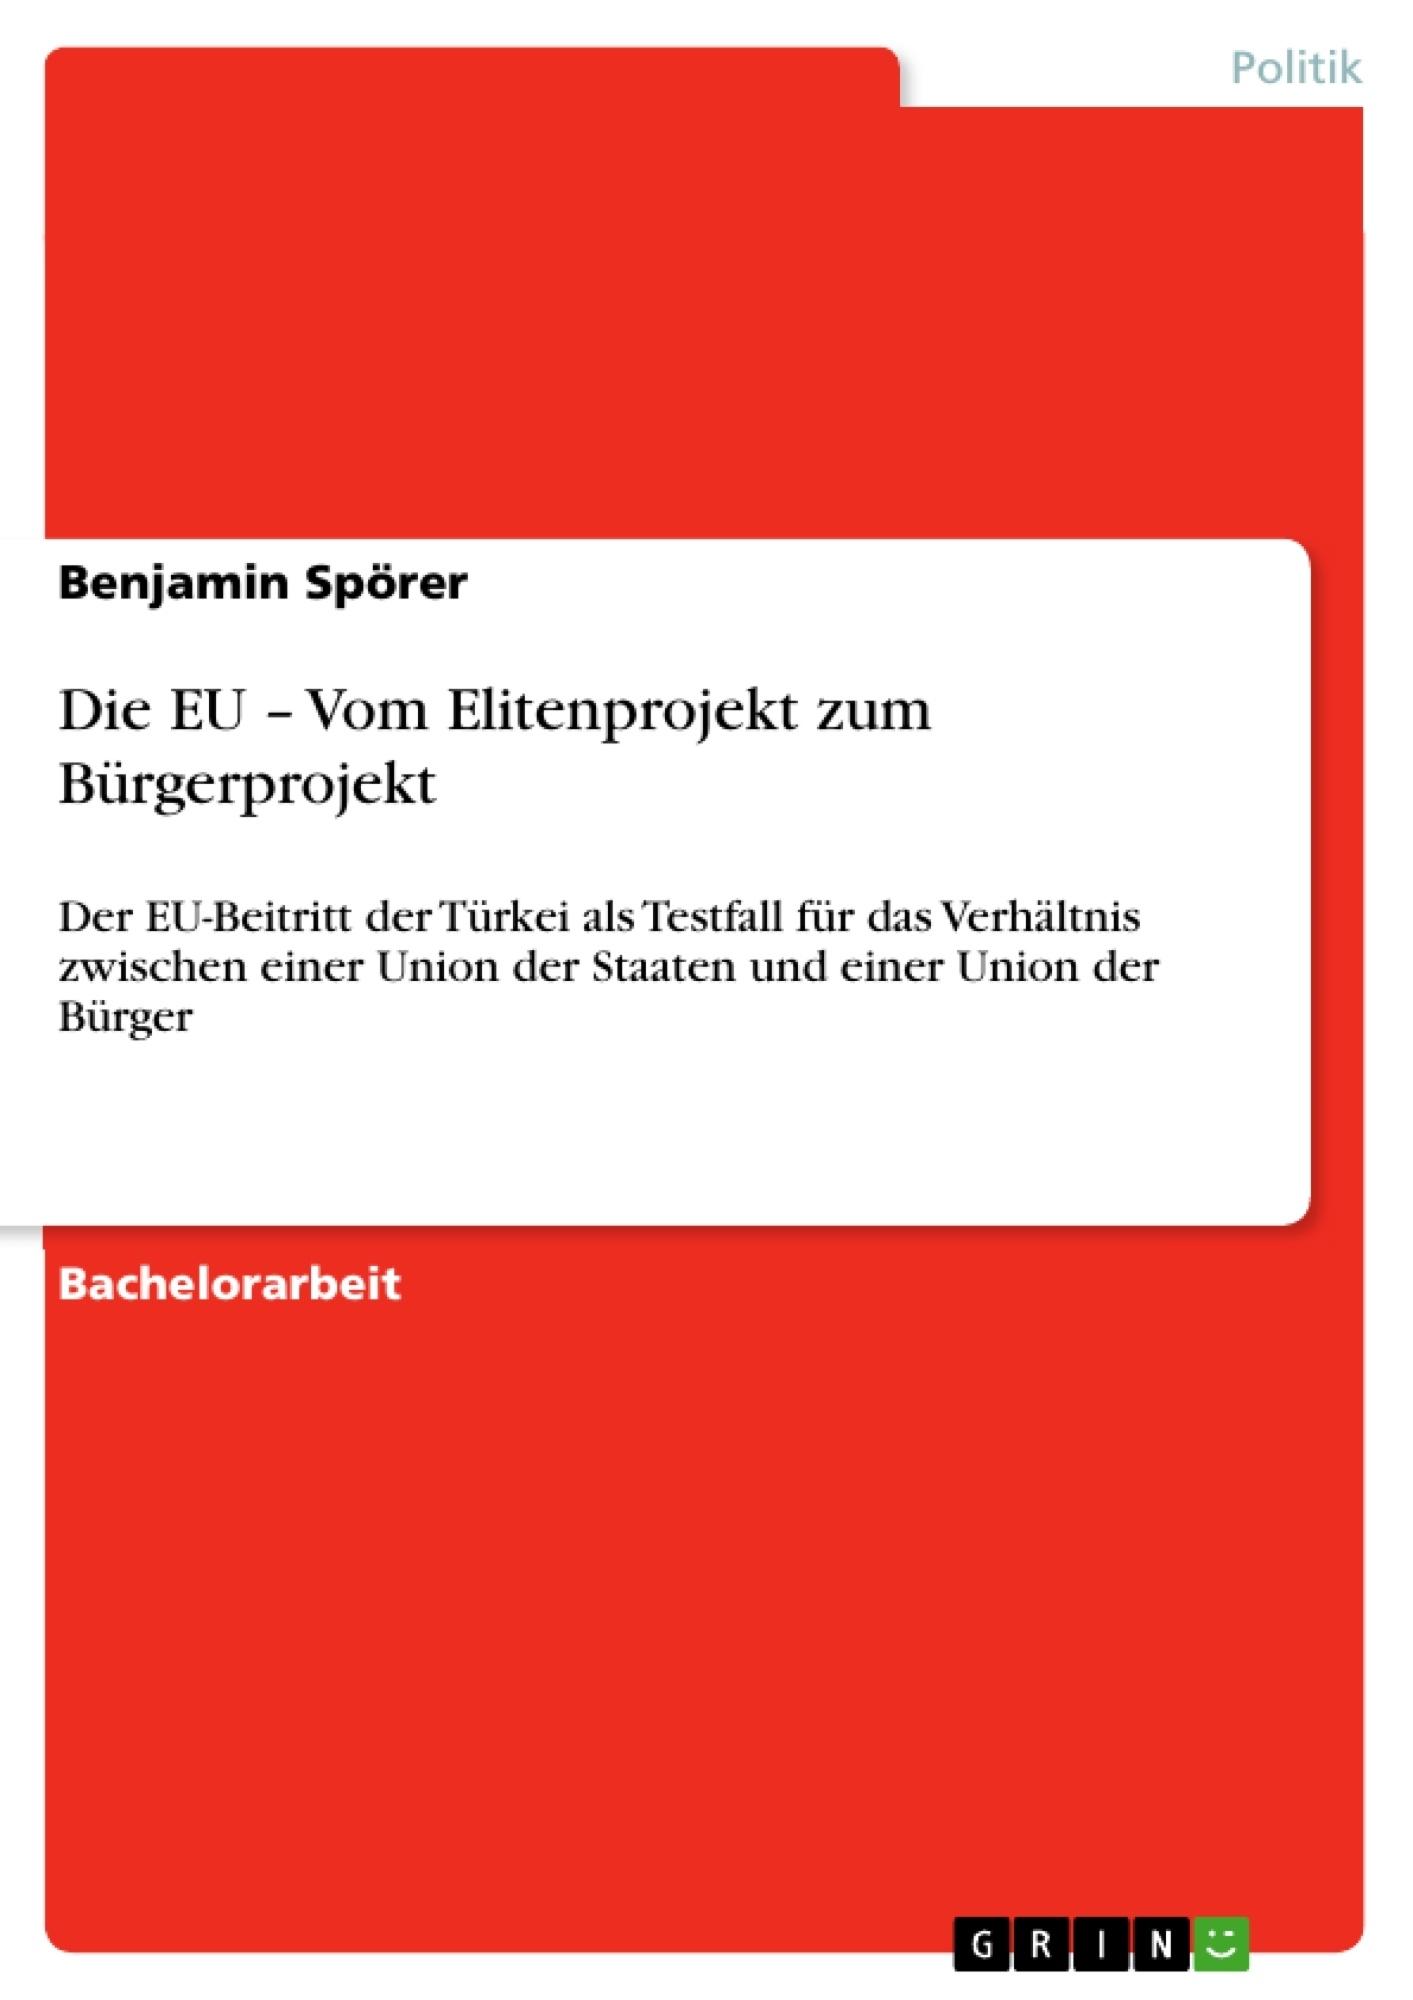 Titel: Die EU – Vom Elitenprojekt zum Bürgerprojekt